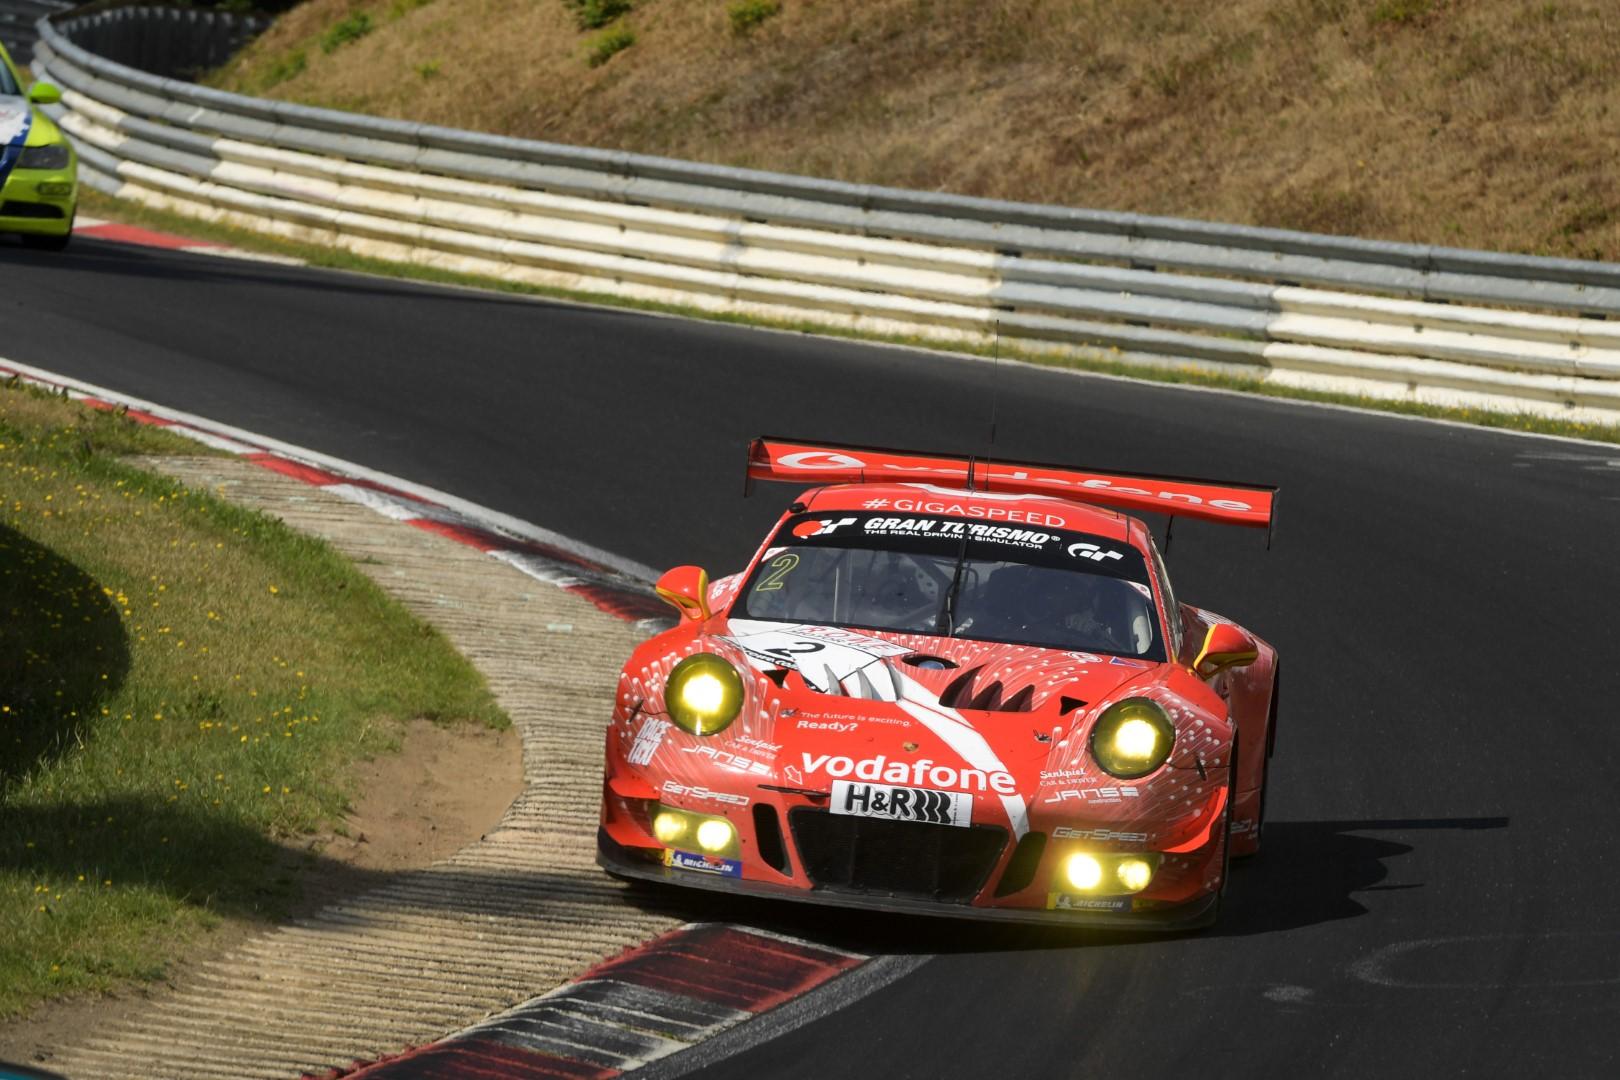 VLN 6. Lauf 2018, Nürburgring-Nordschleife - Foto: Gruppe C Photography; #002 Porsche 911 GT3 R, Team GetSpeed Performance: Steve Jans, Marek Böckmann, Philip Hamprecht, Adam Osieka